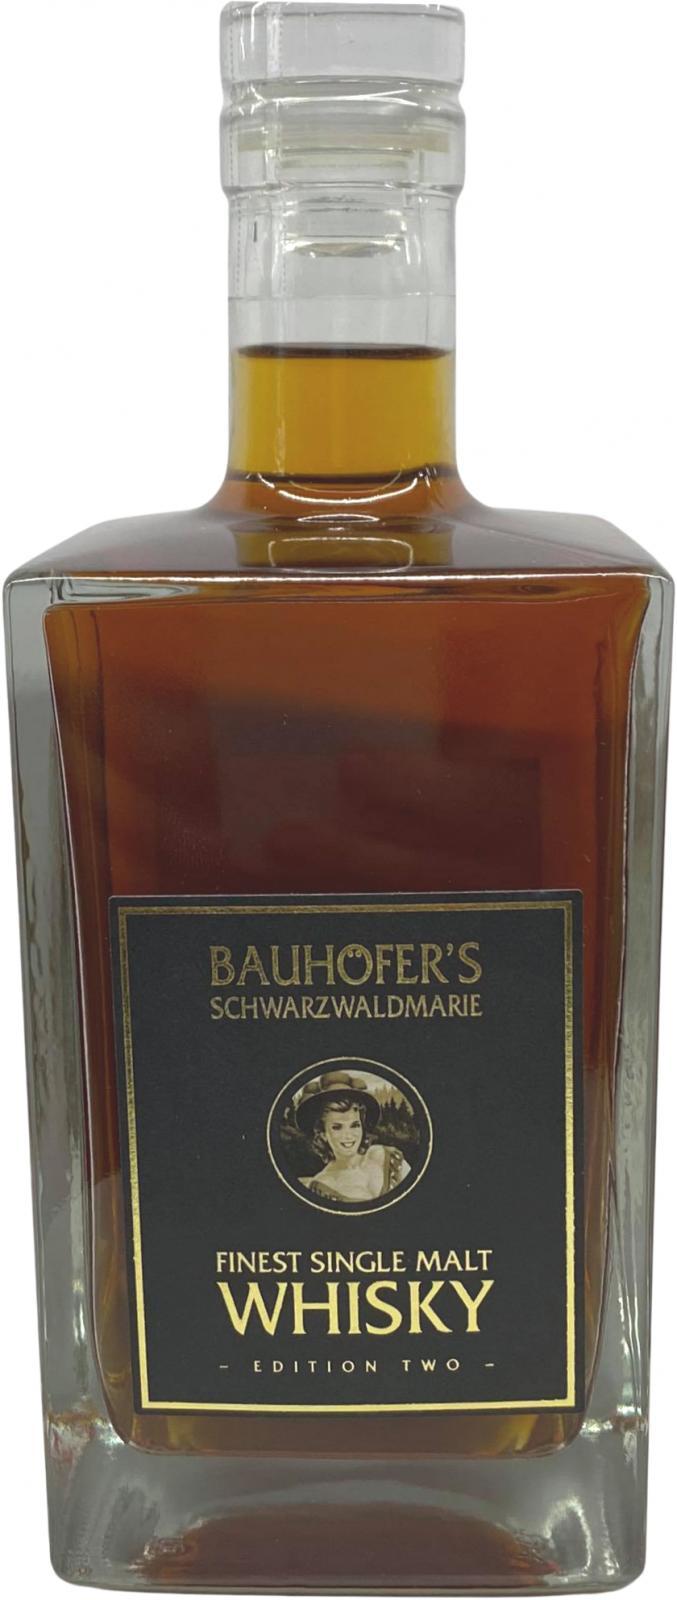 Bauhöfer's Schwarzwaldmarie Finest Single Malt Whisky